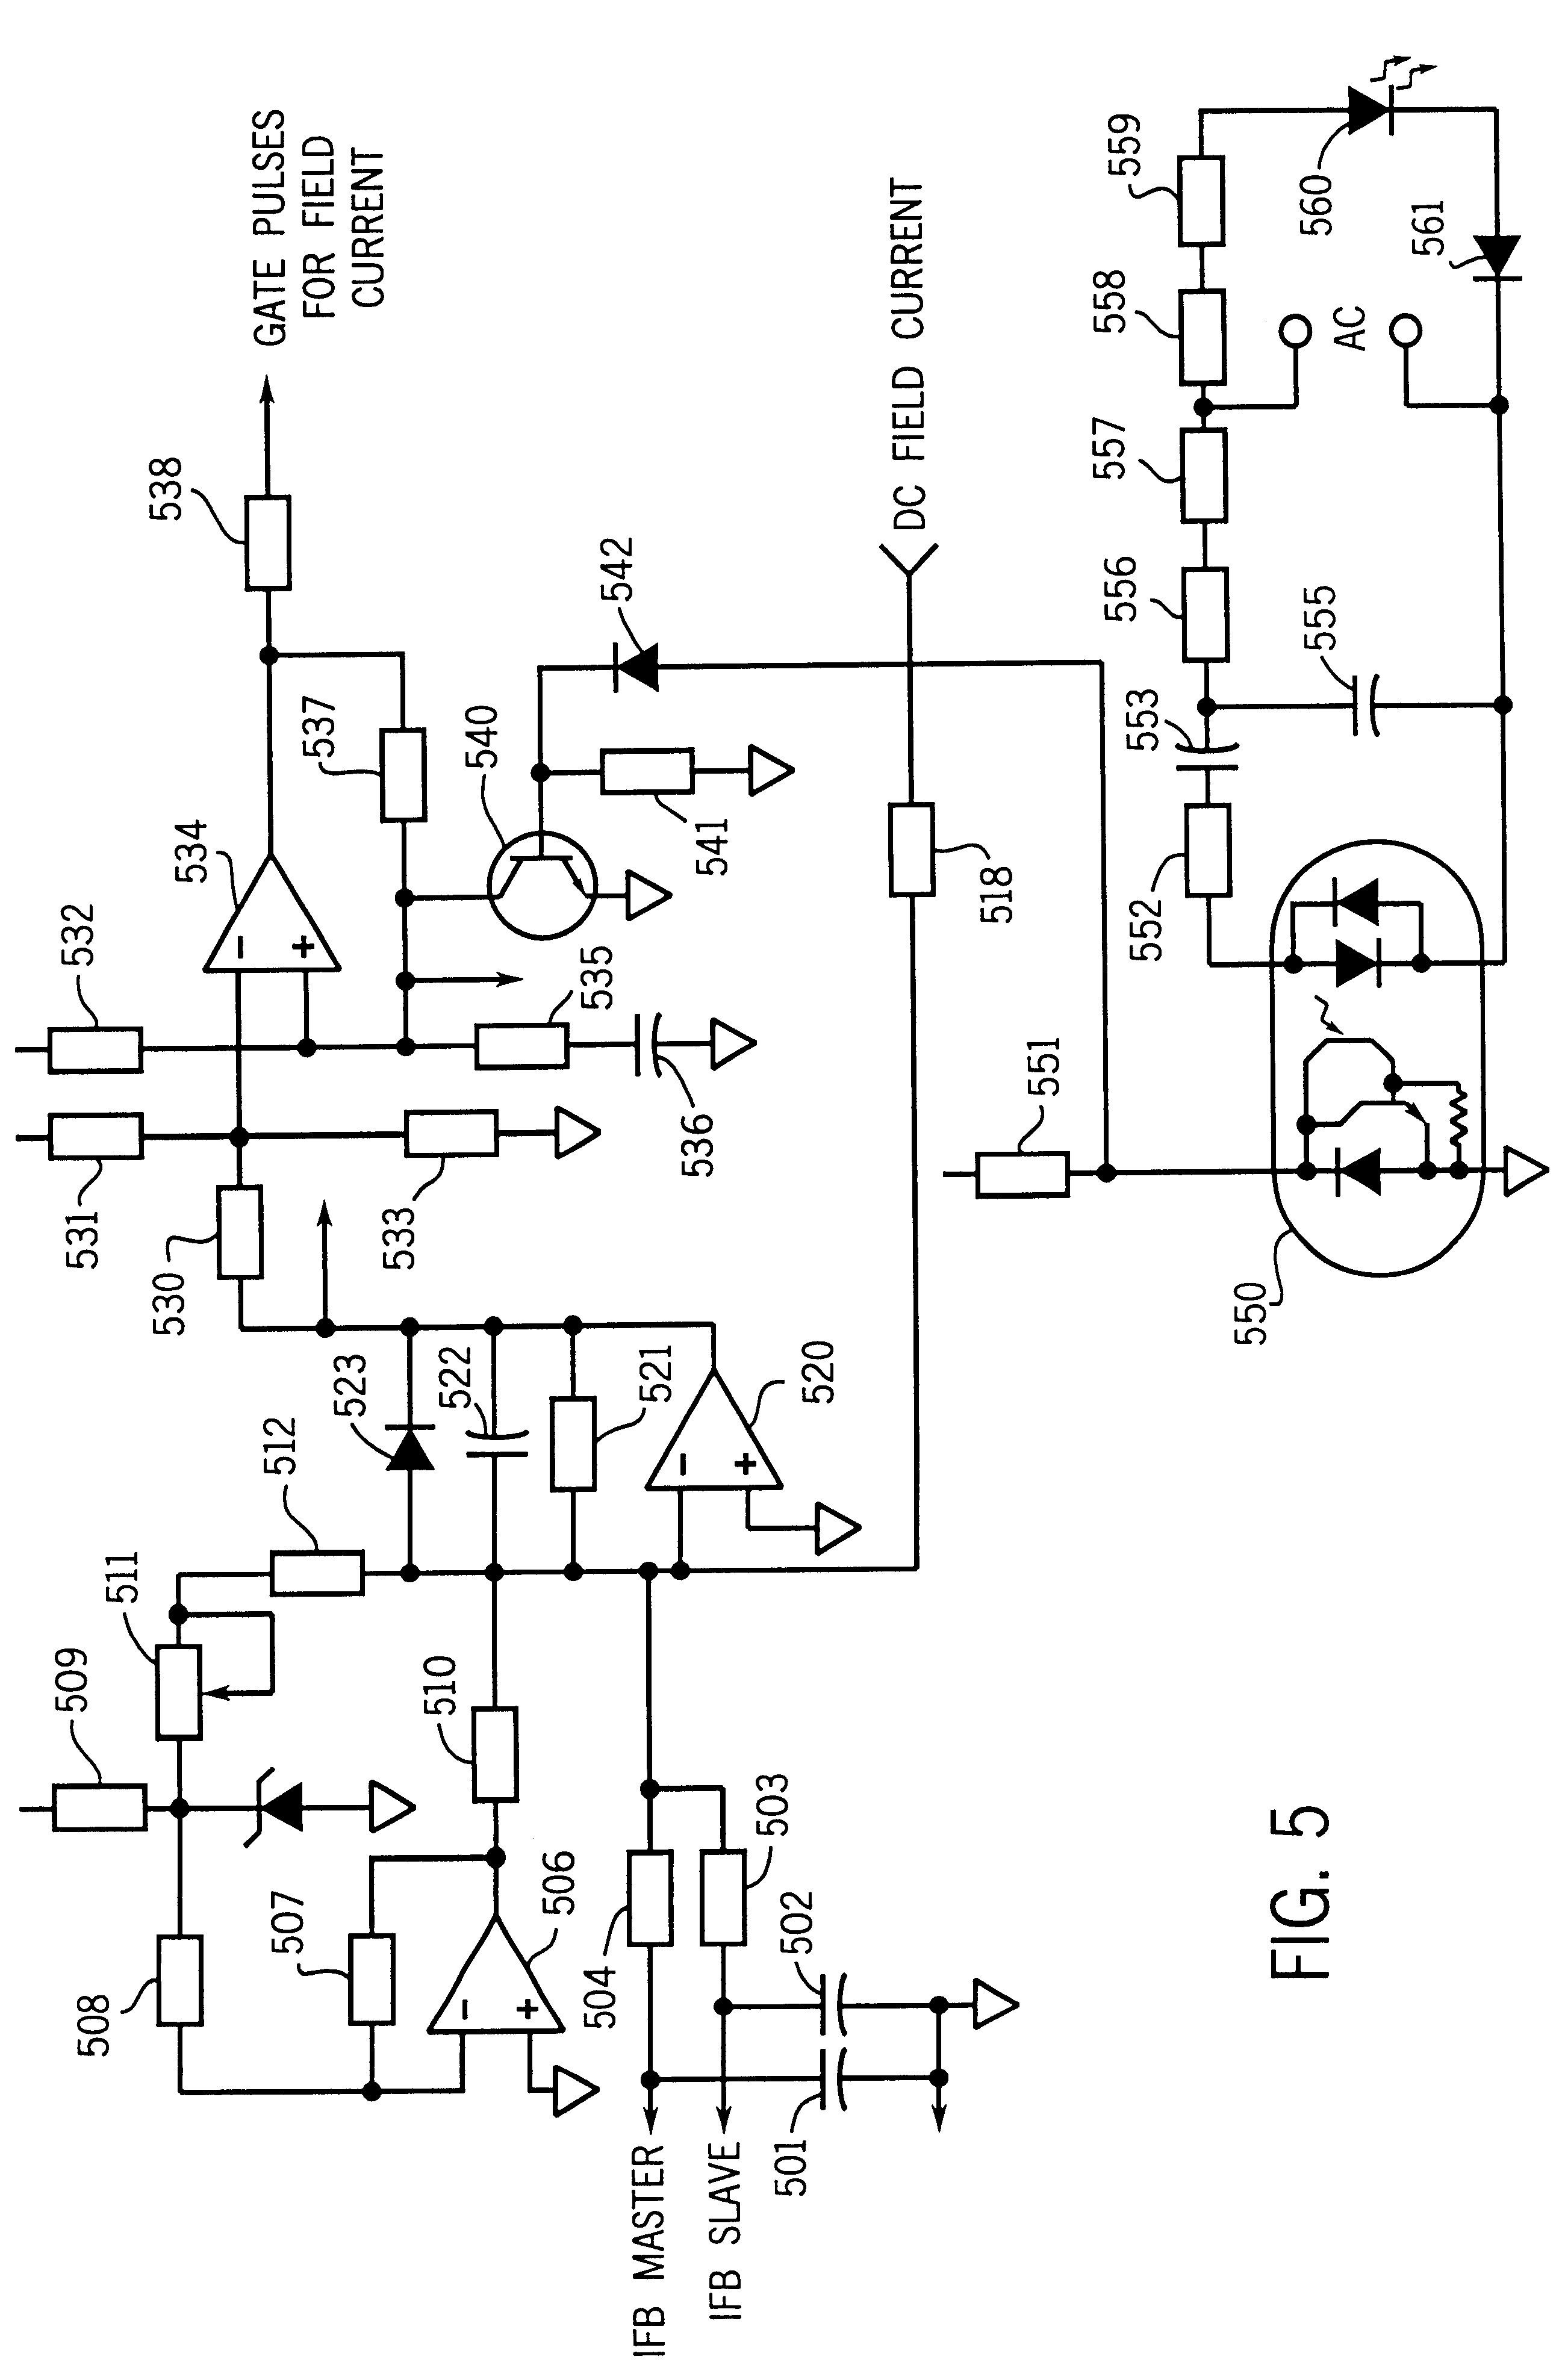 alternator welder diagram